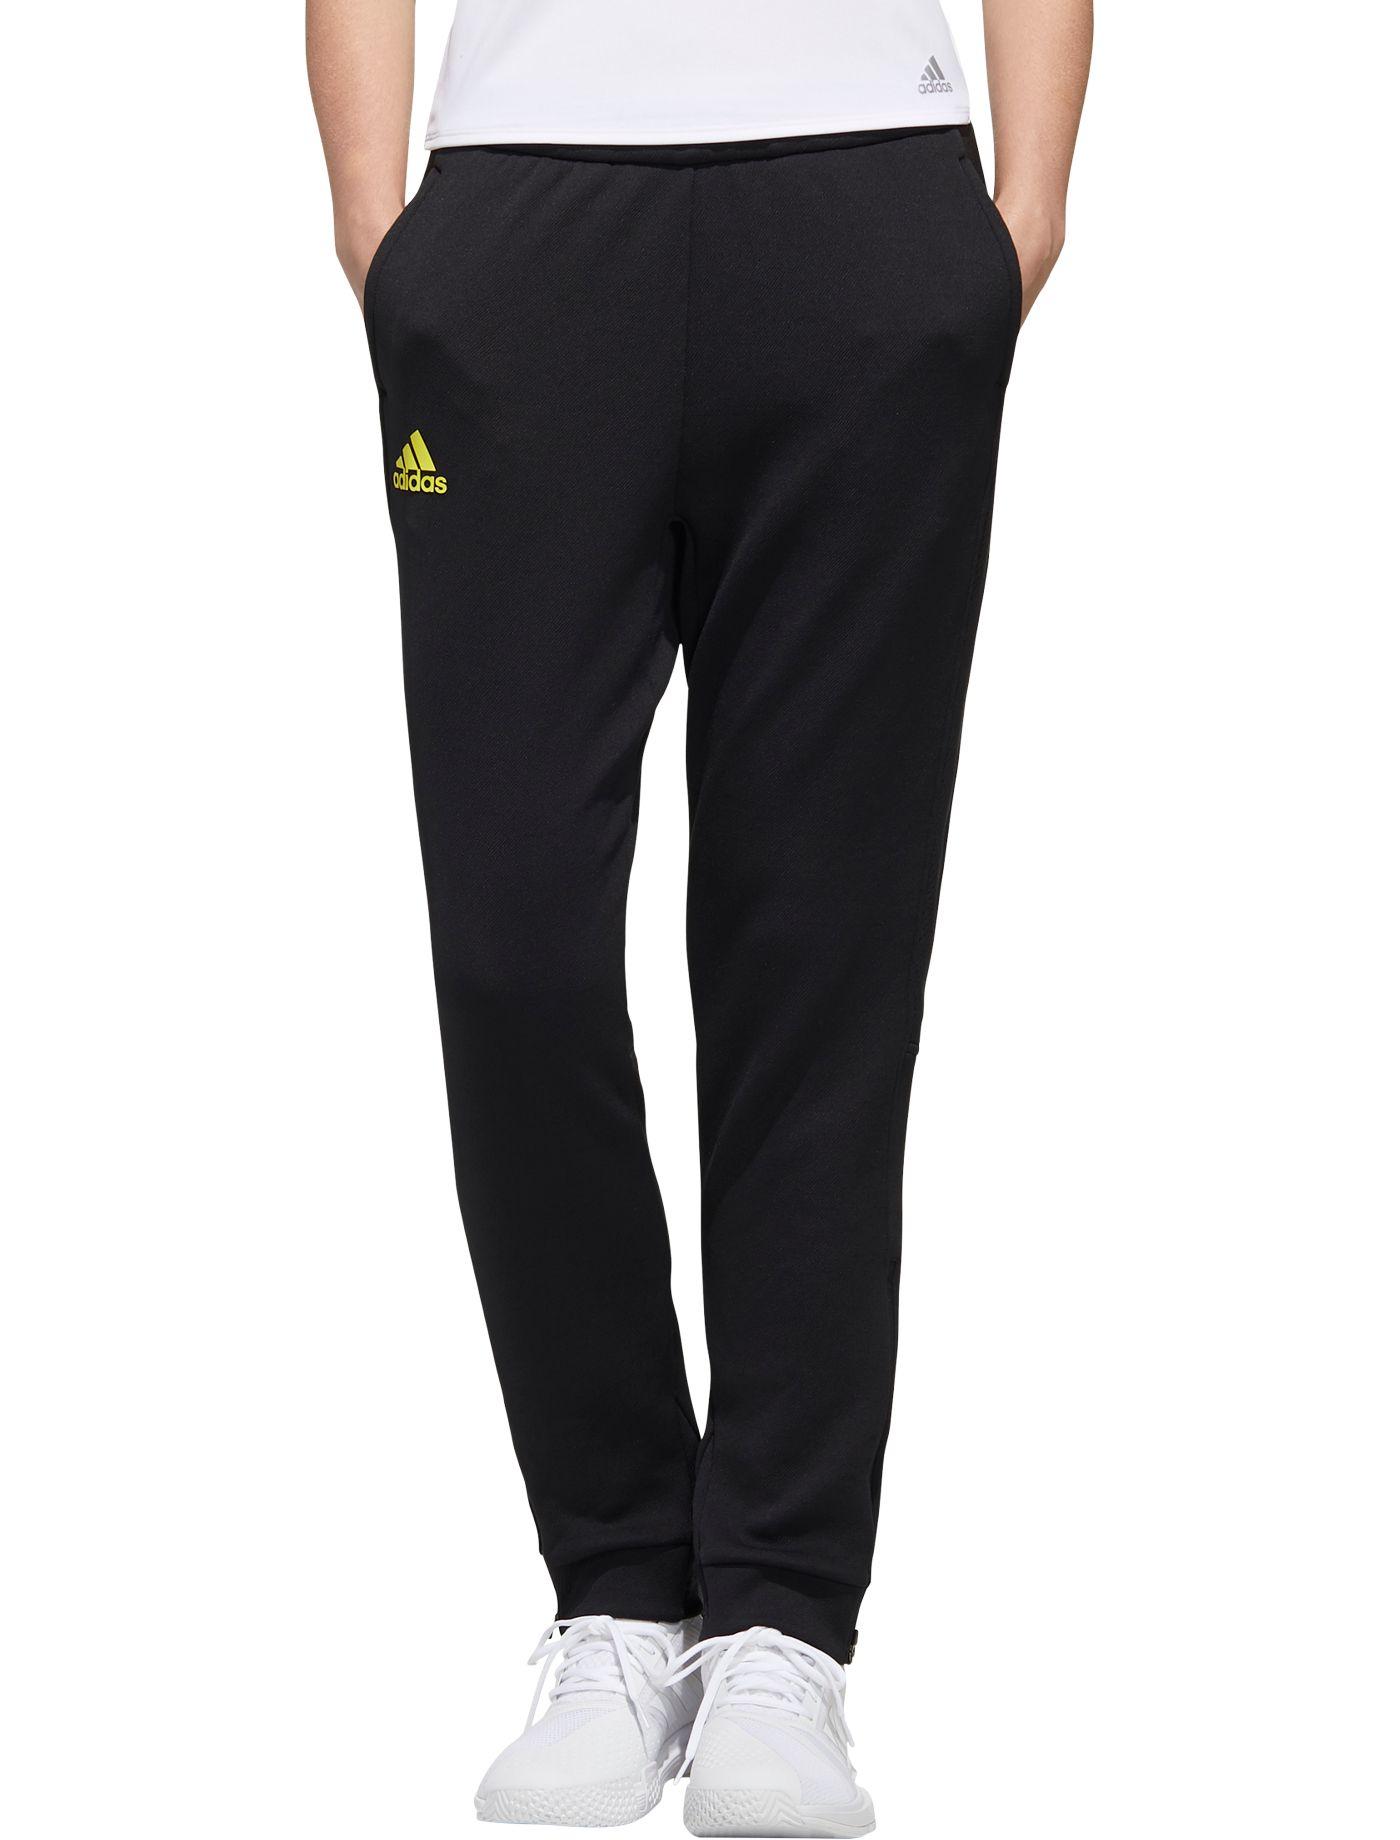 adidas Women's Knit Tennis Pants